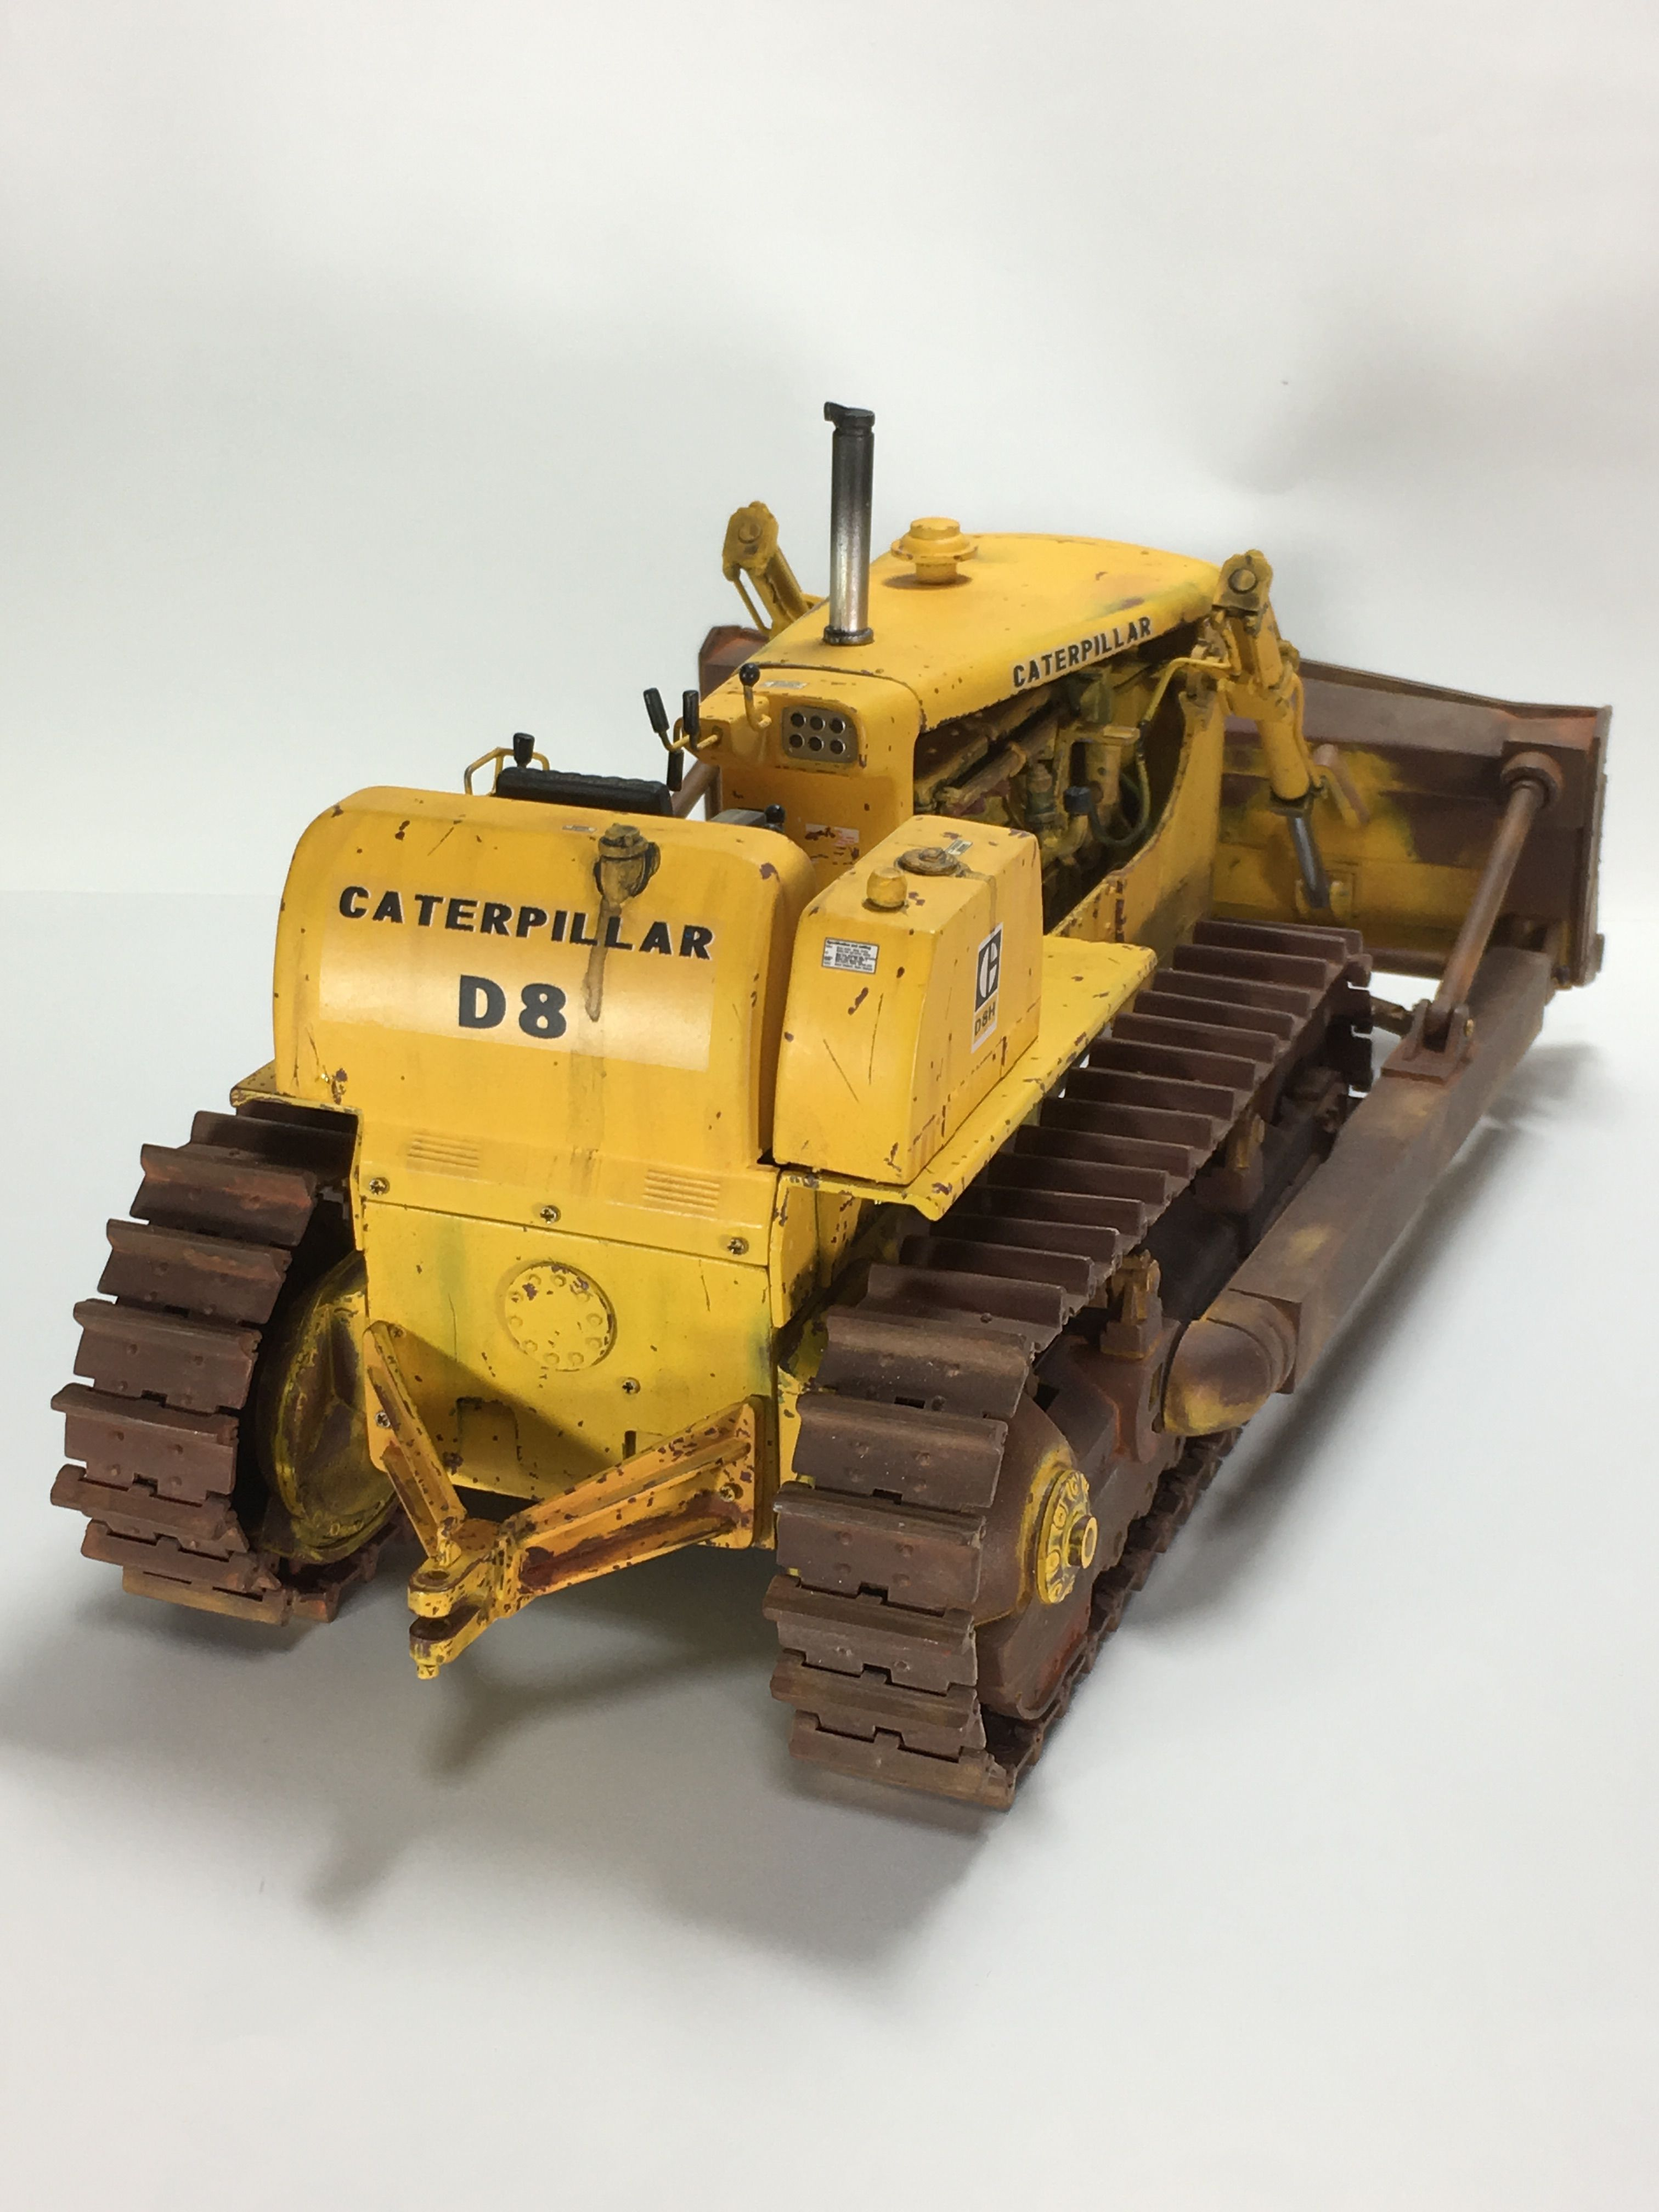 Pin by Mico Equipment on Classic Dozers   Caterpillar